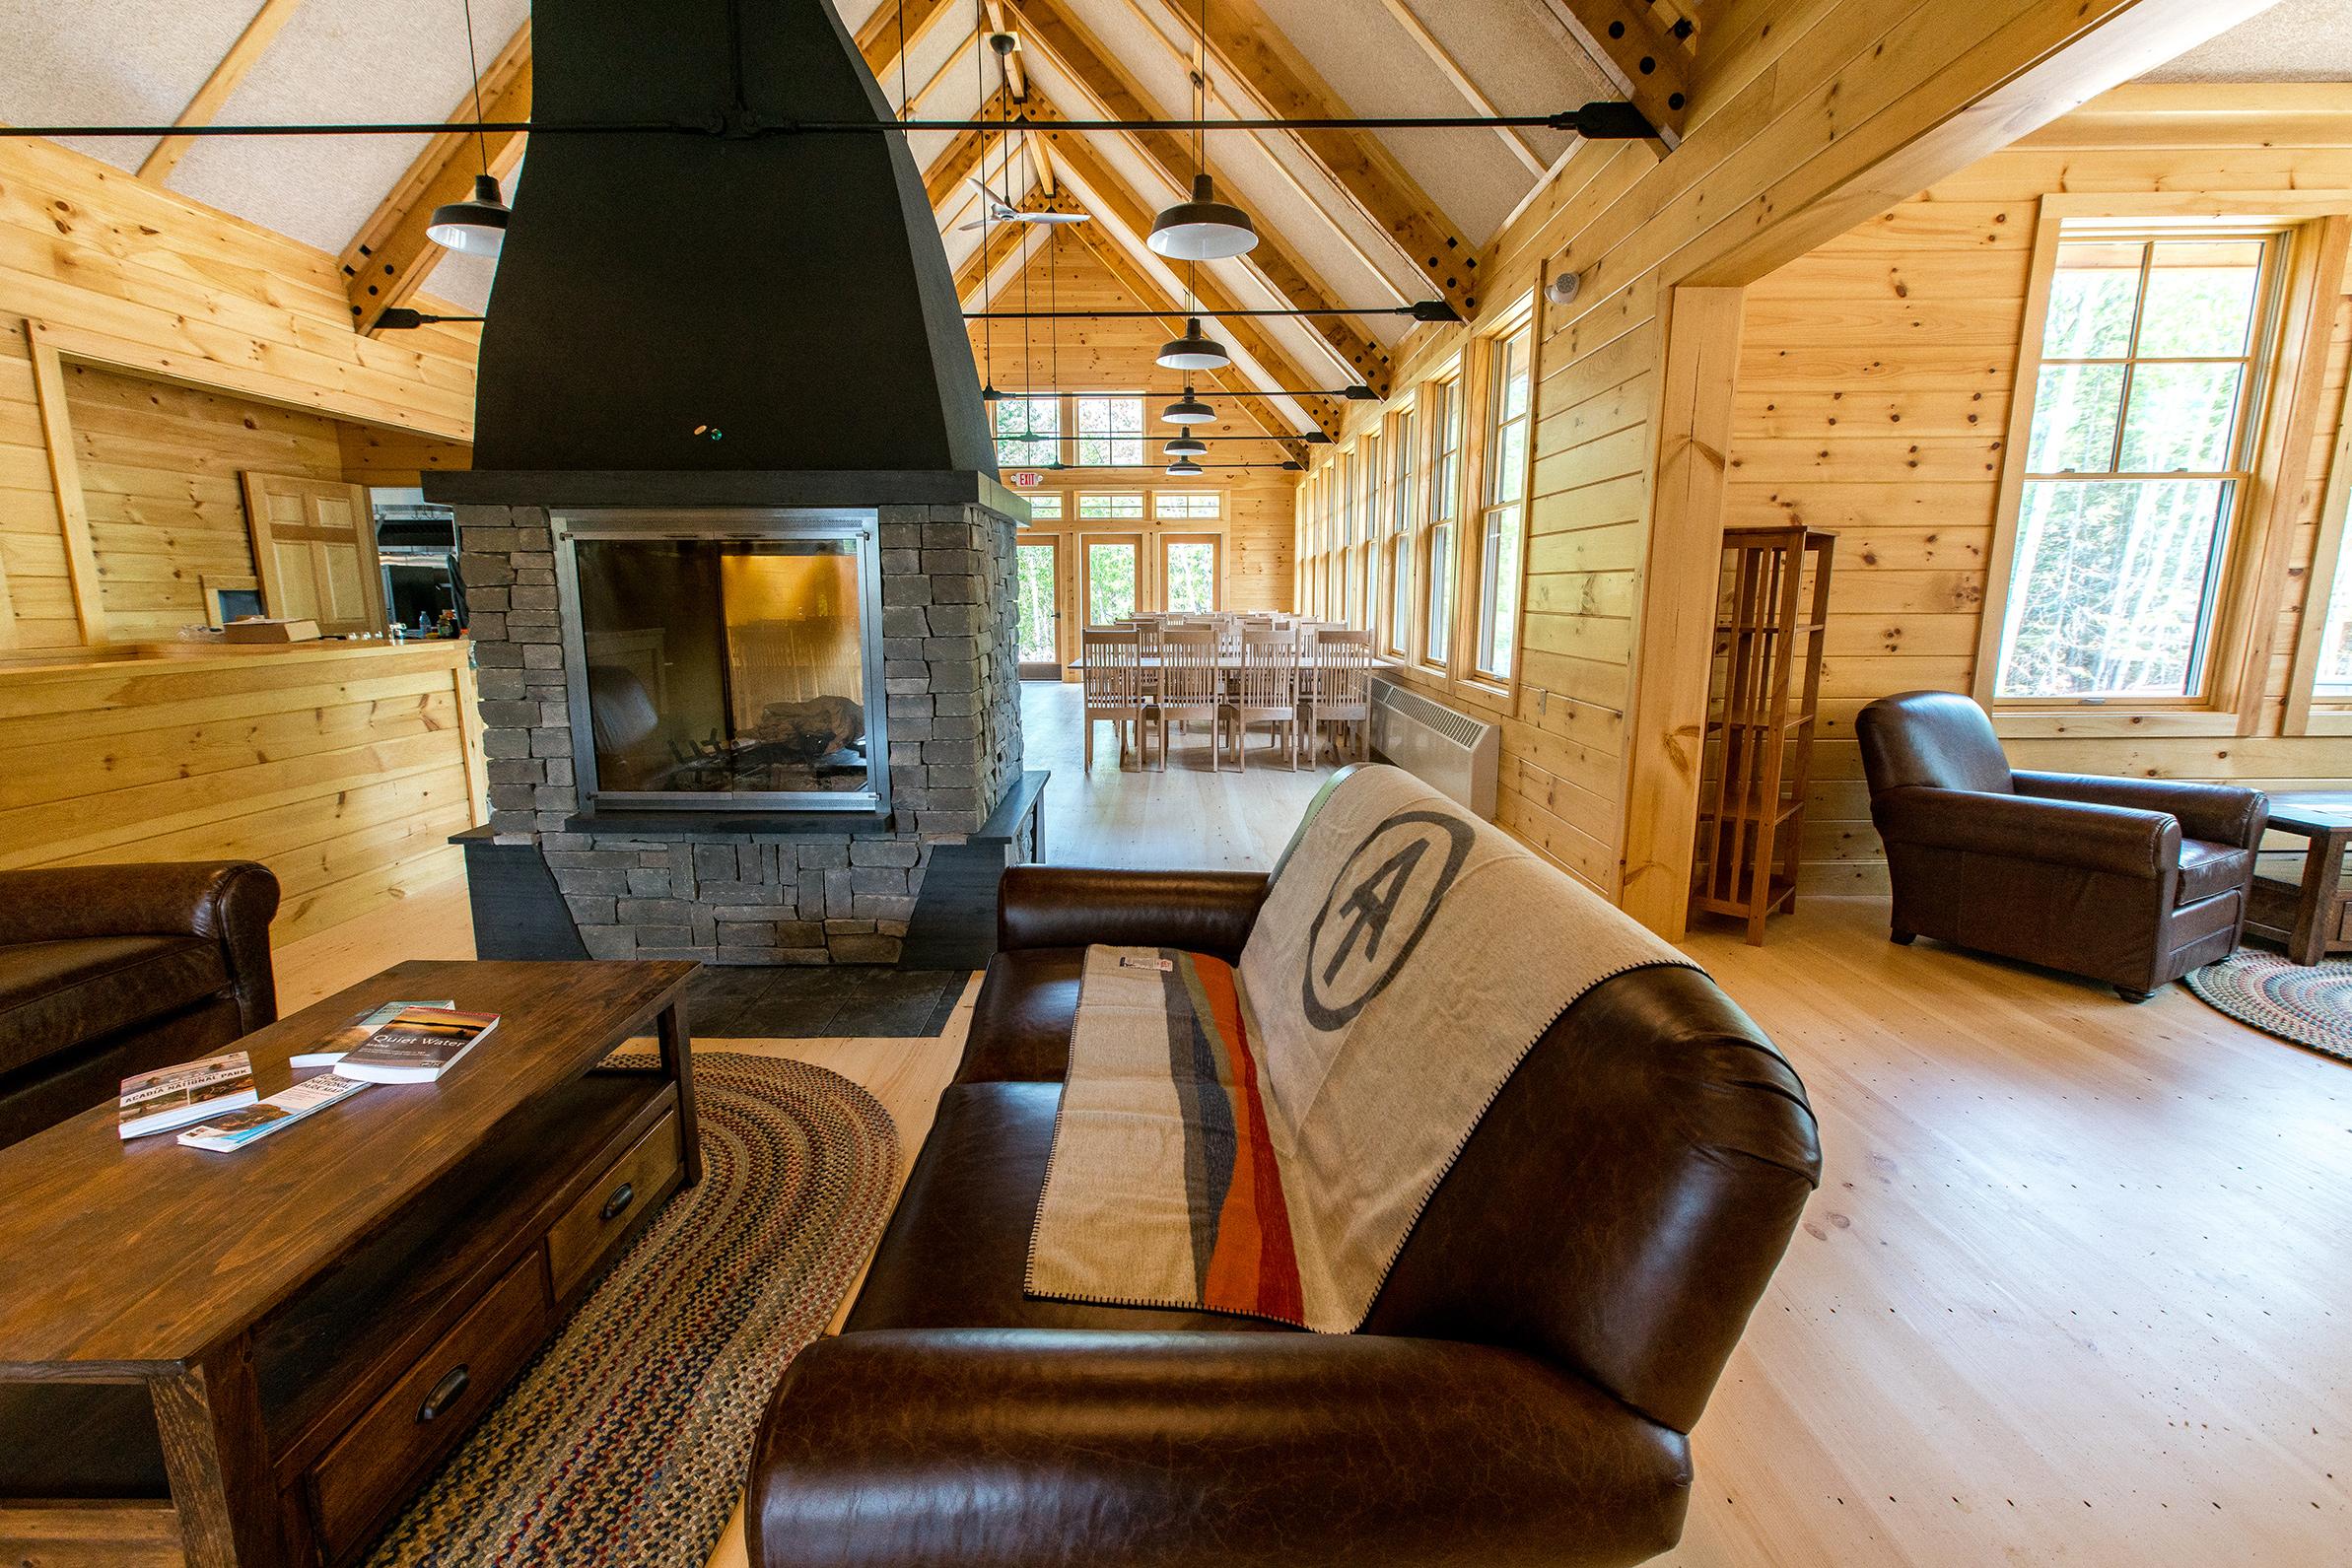 The interior common area of Meawisla Lodge.